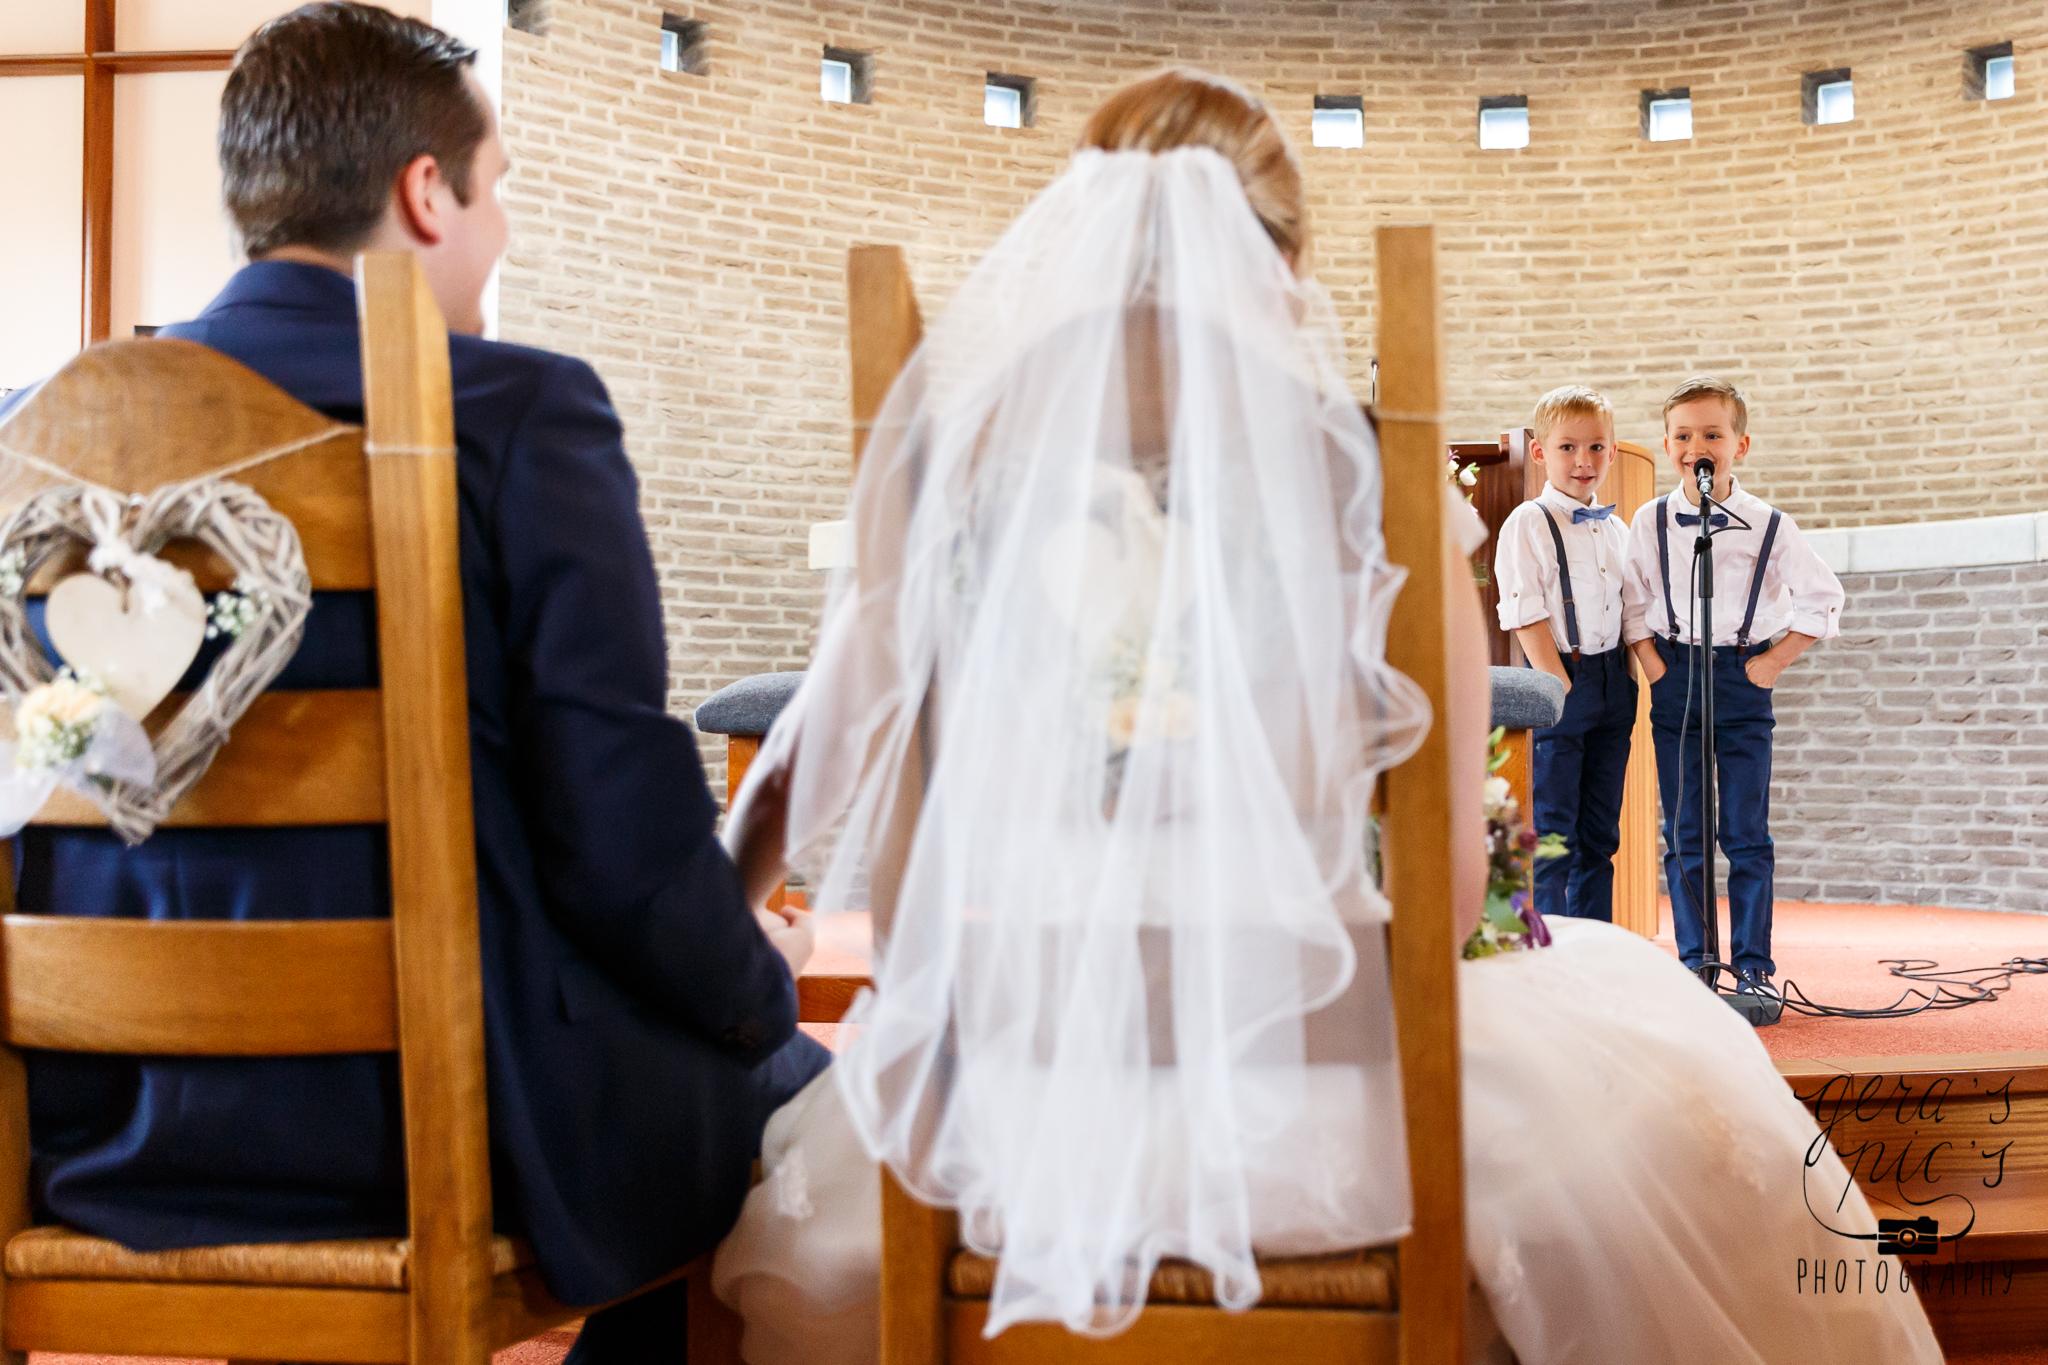 bruiloftsfotografie Gera's Pic's Photography-18